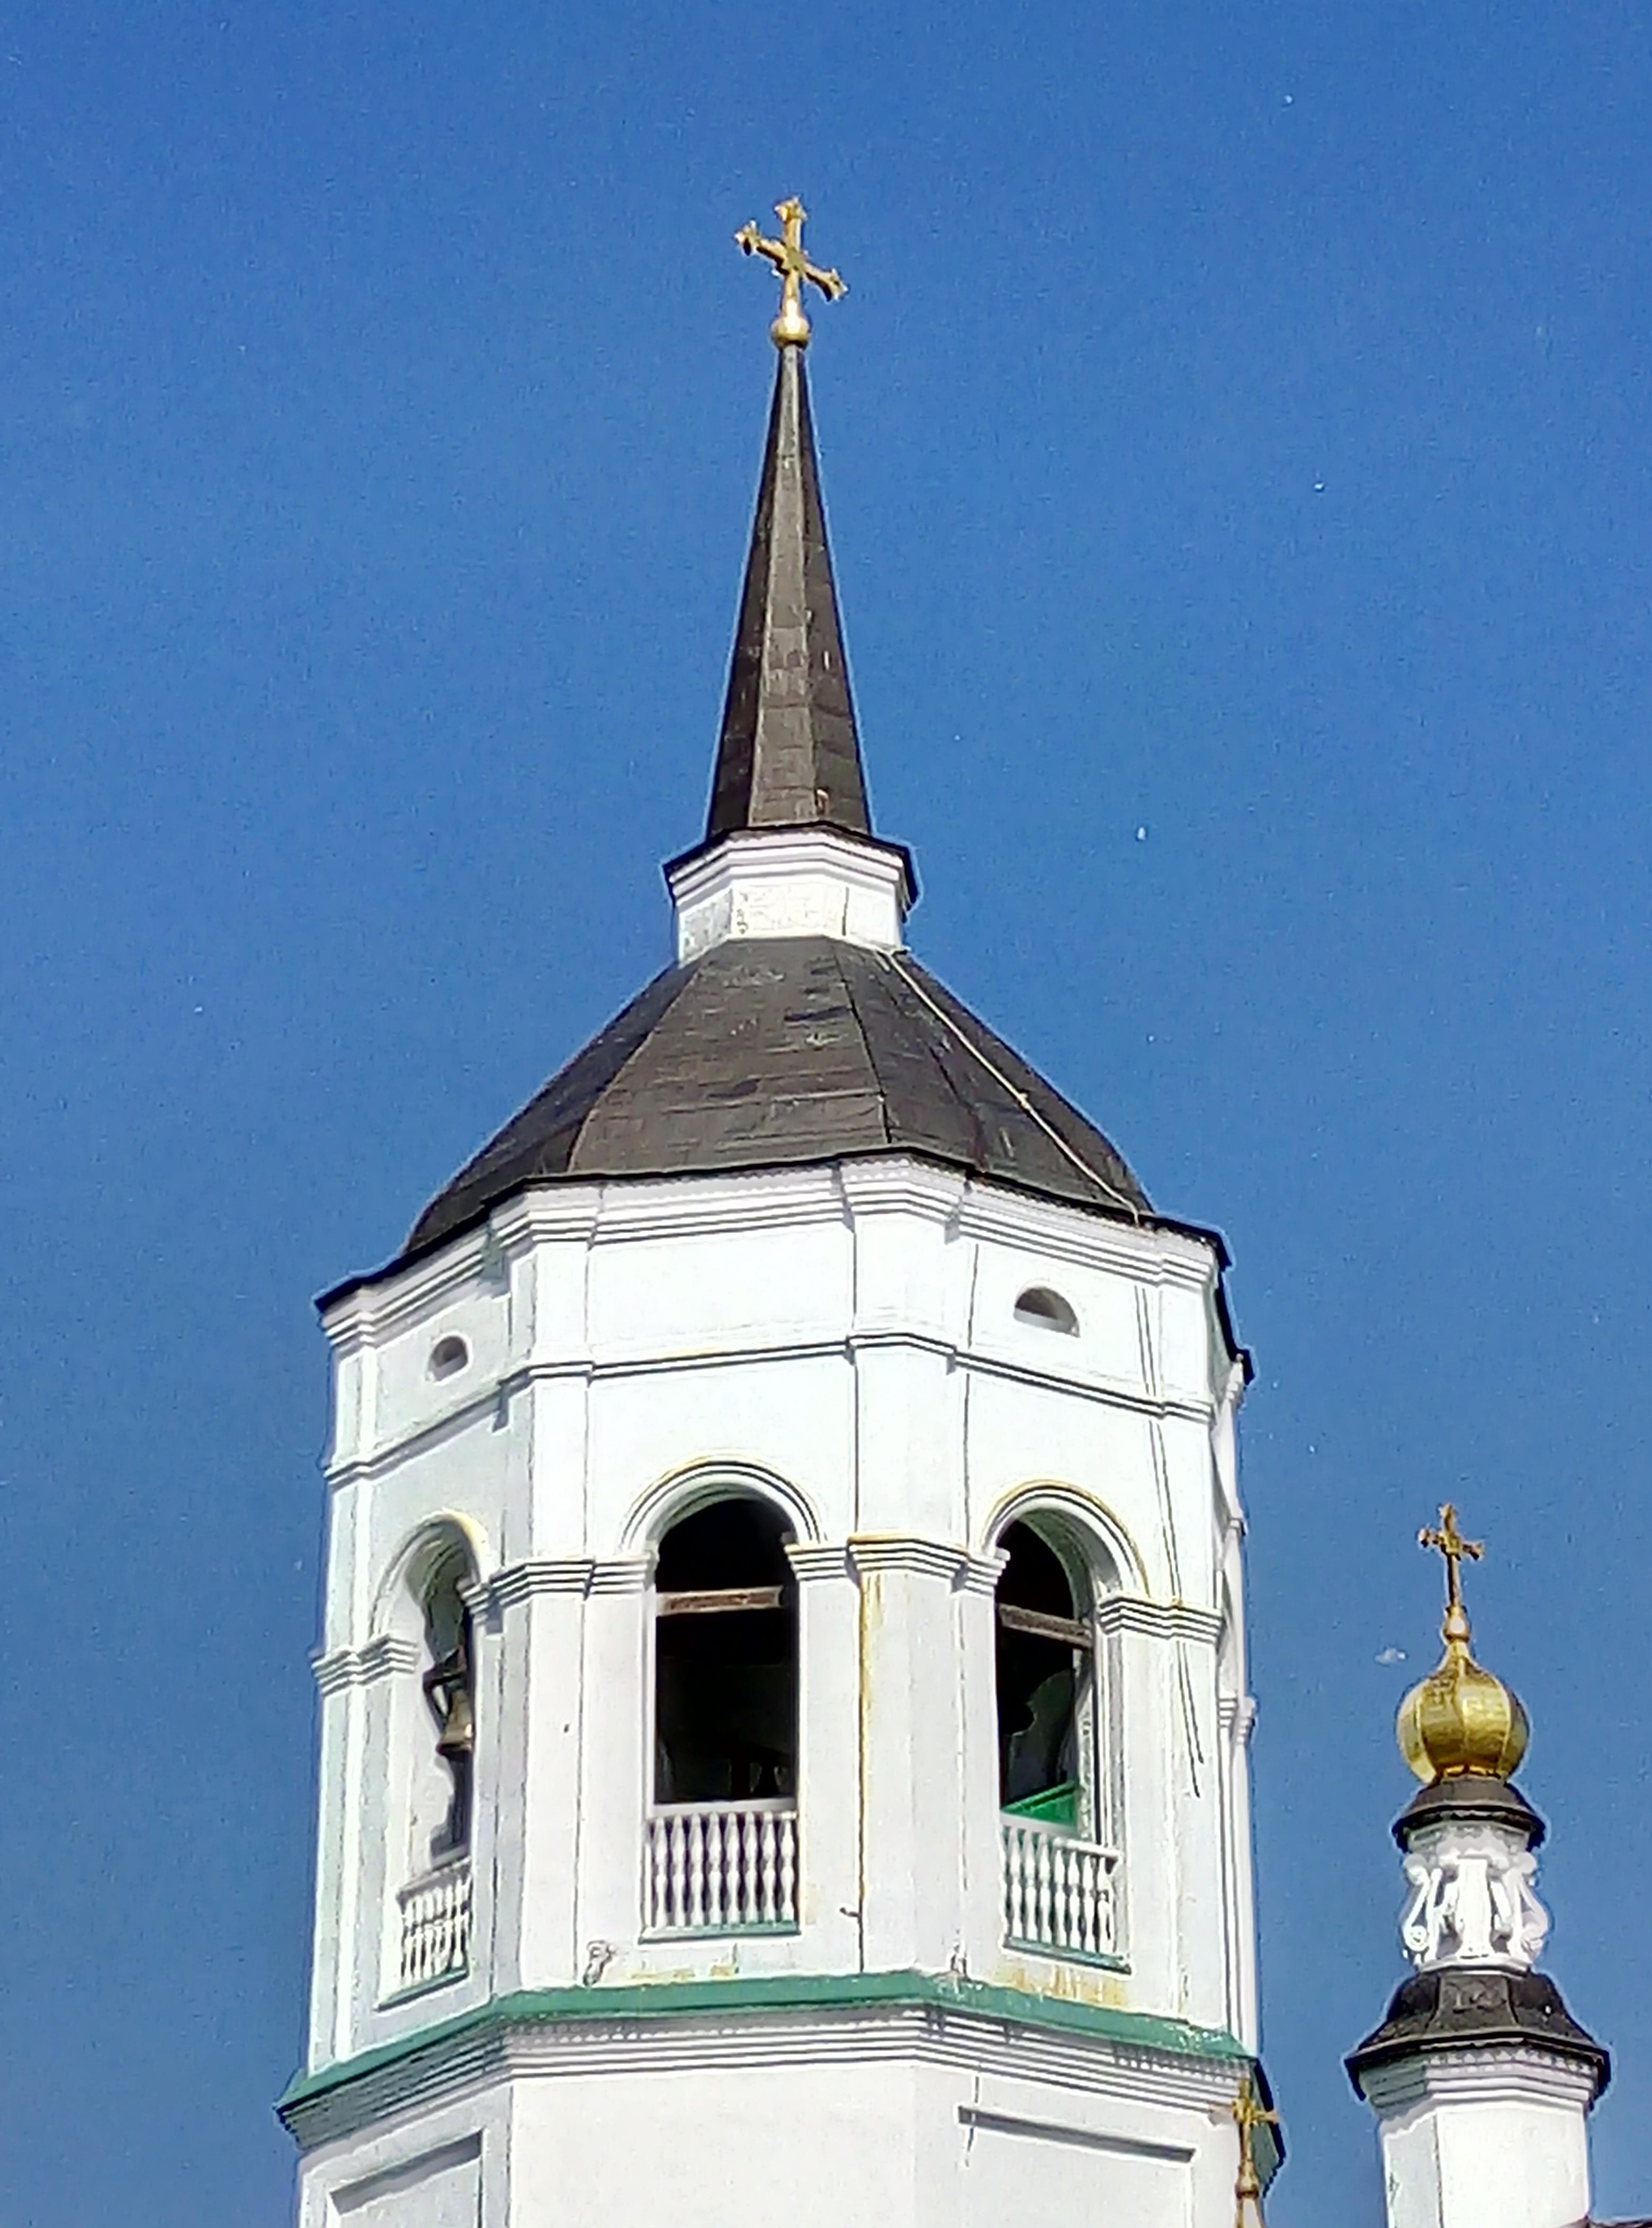 2019 06 27 10 05 12 - Rússia-Tomsk e as igrejas